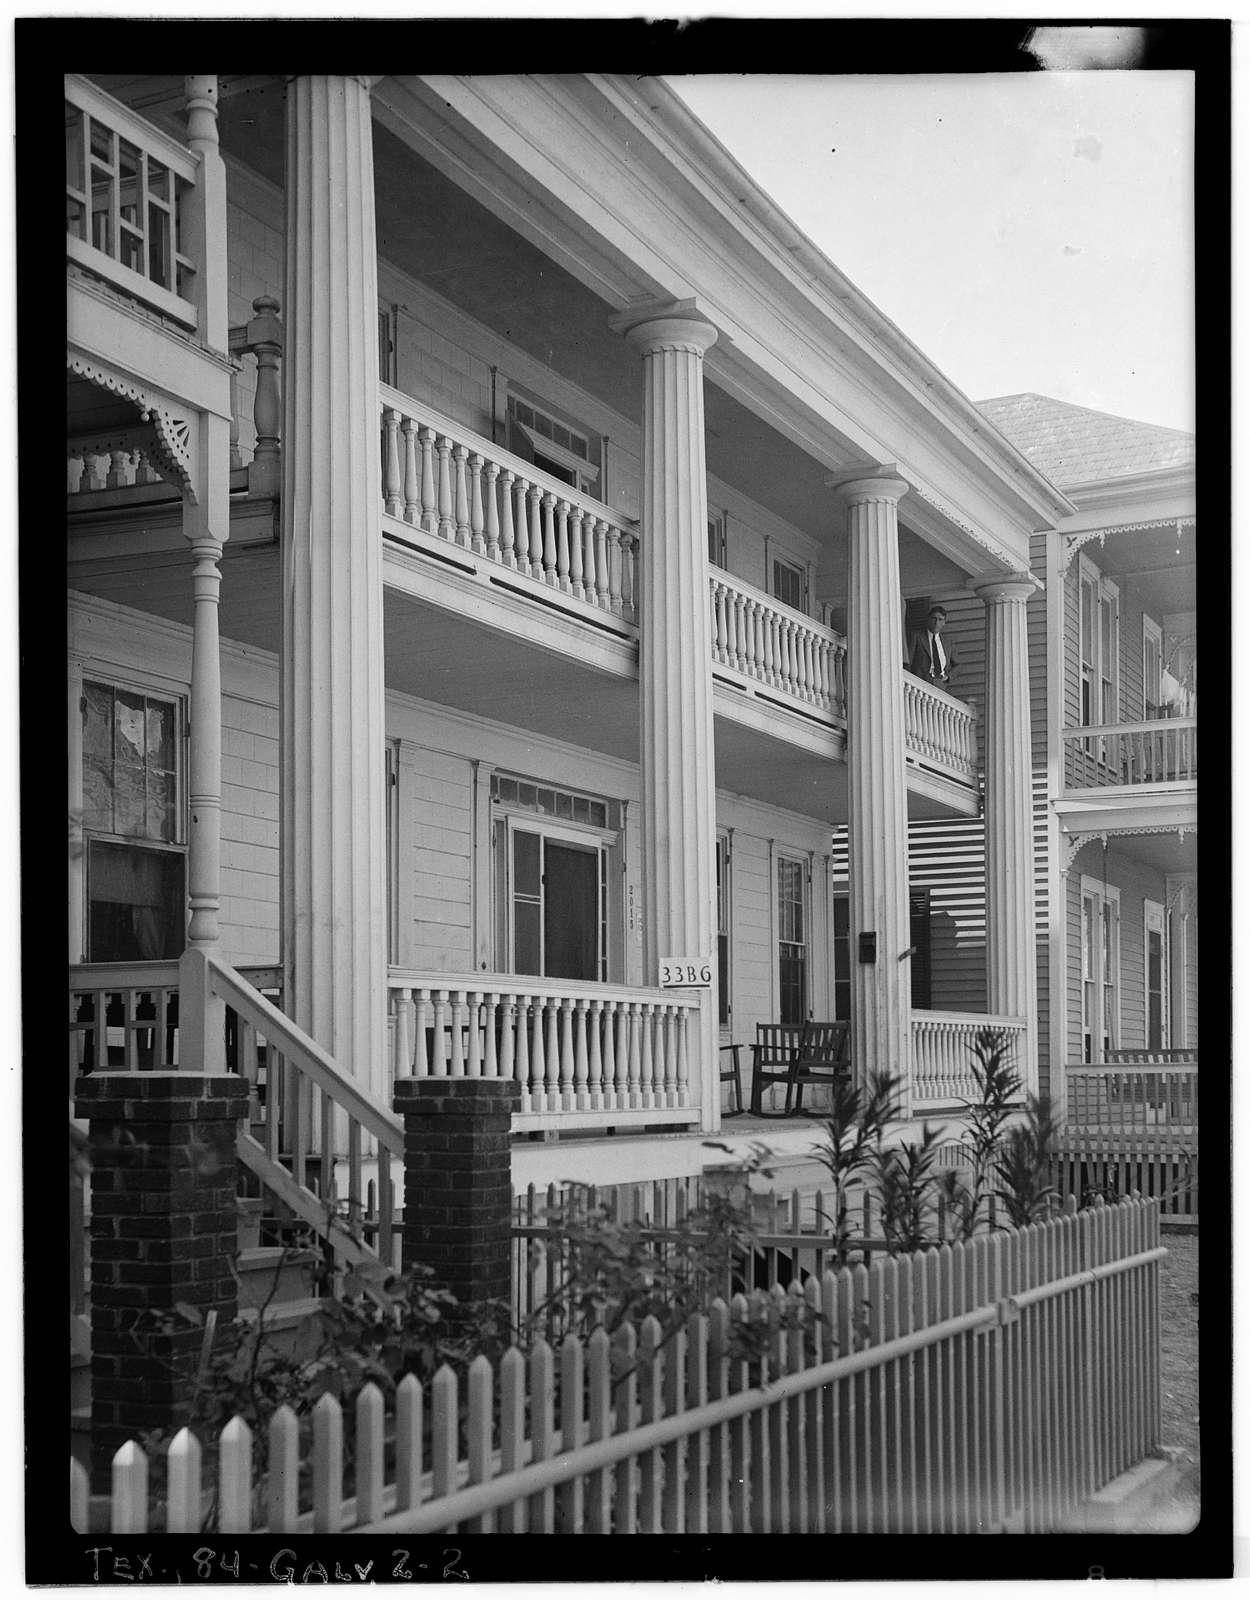 Turner Hall, 2015 Avenue I, Galveston, Galveston County, TX